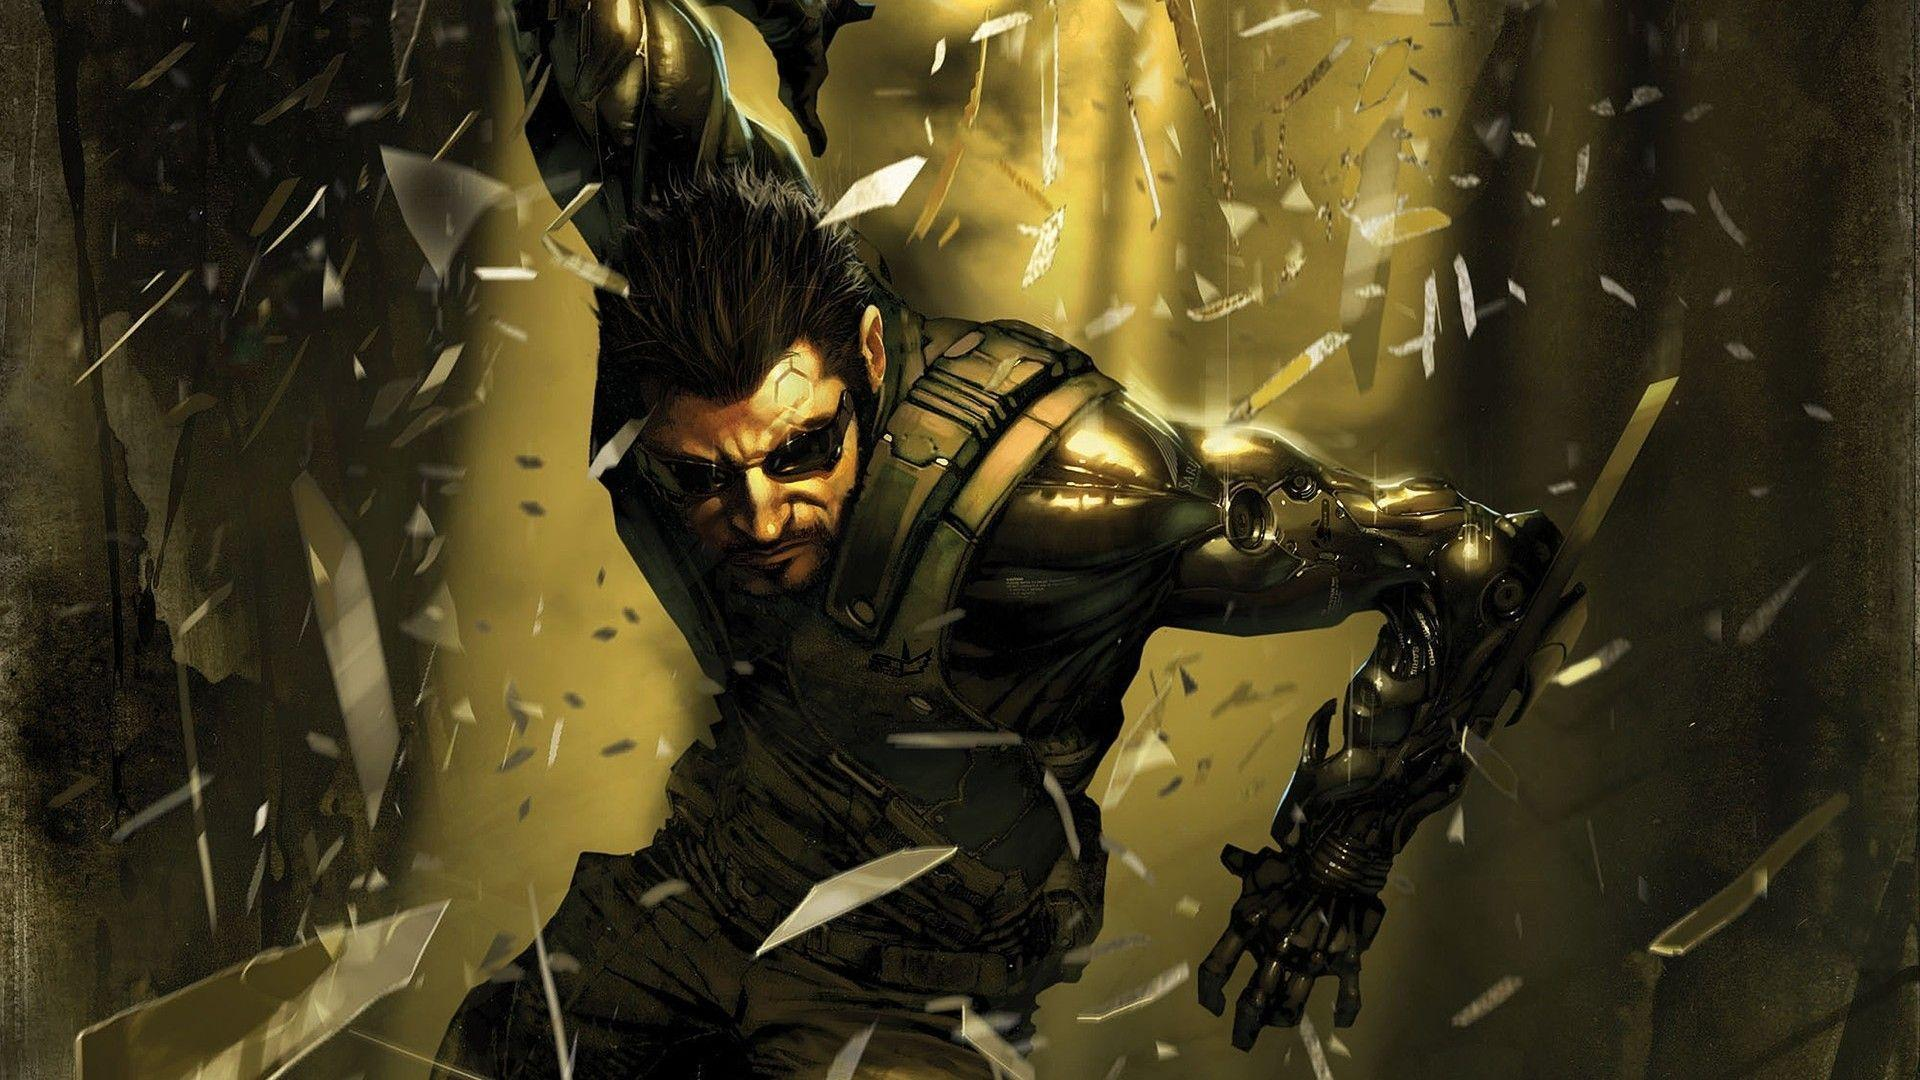 Deus Ex Wallpapers Wallpaper Cave